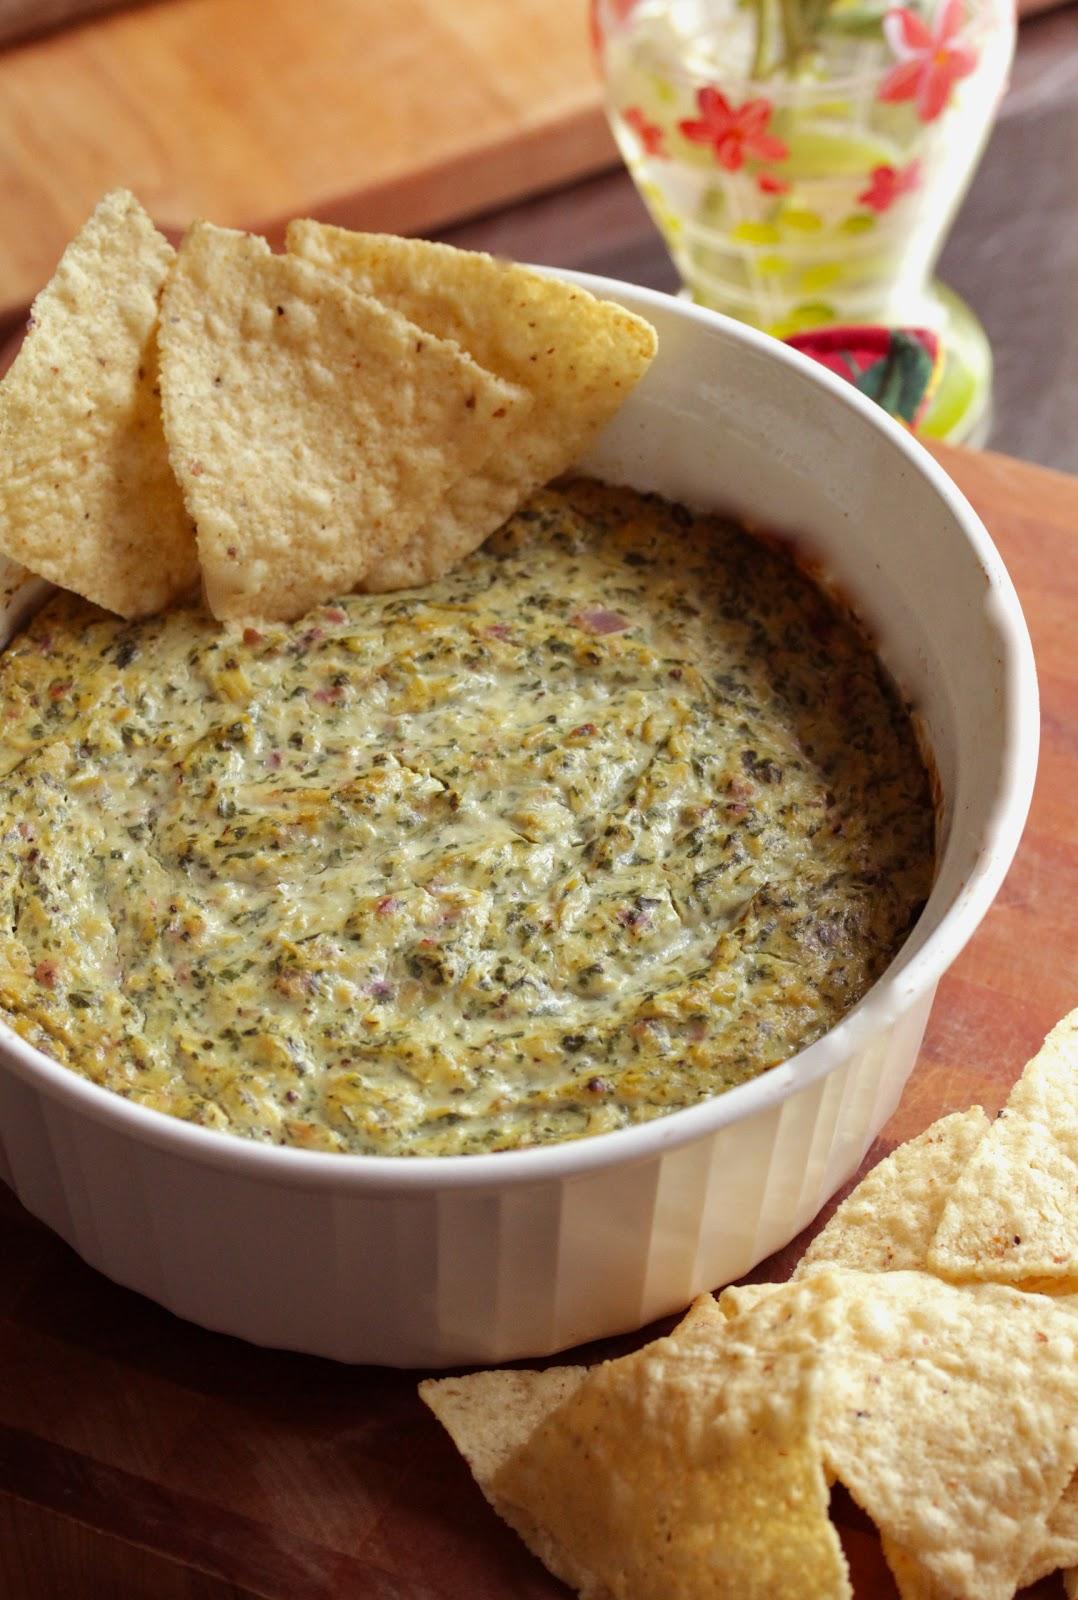 Chloes-kitchen-recipe-warm-spinach-artichoke-dip